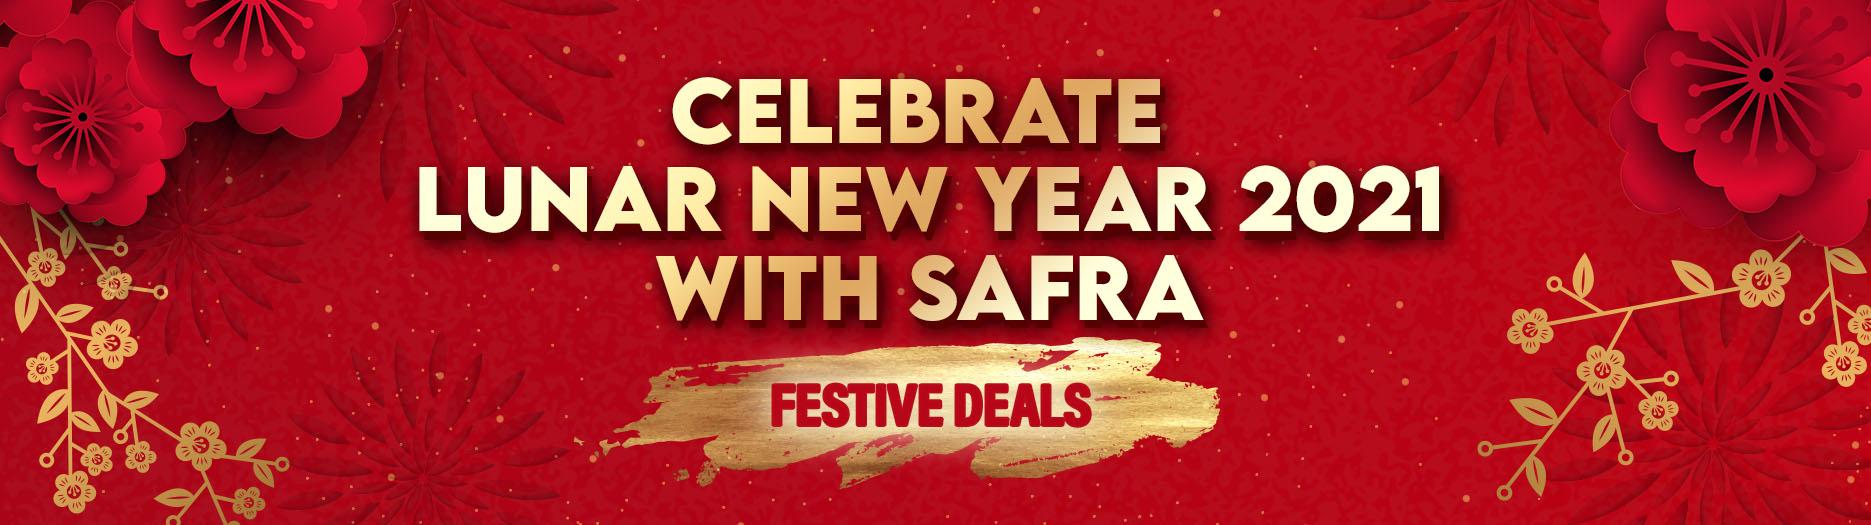 1871x525px CNY 2021 (festive deals)